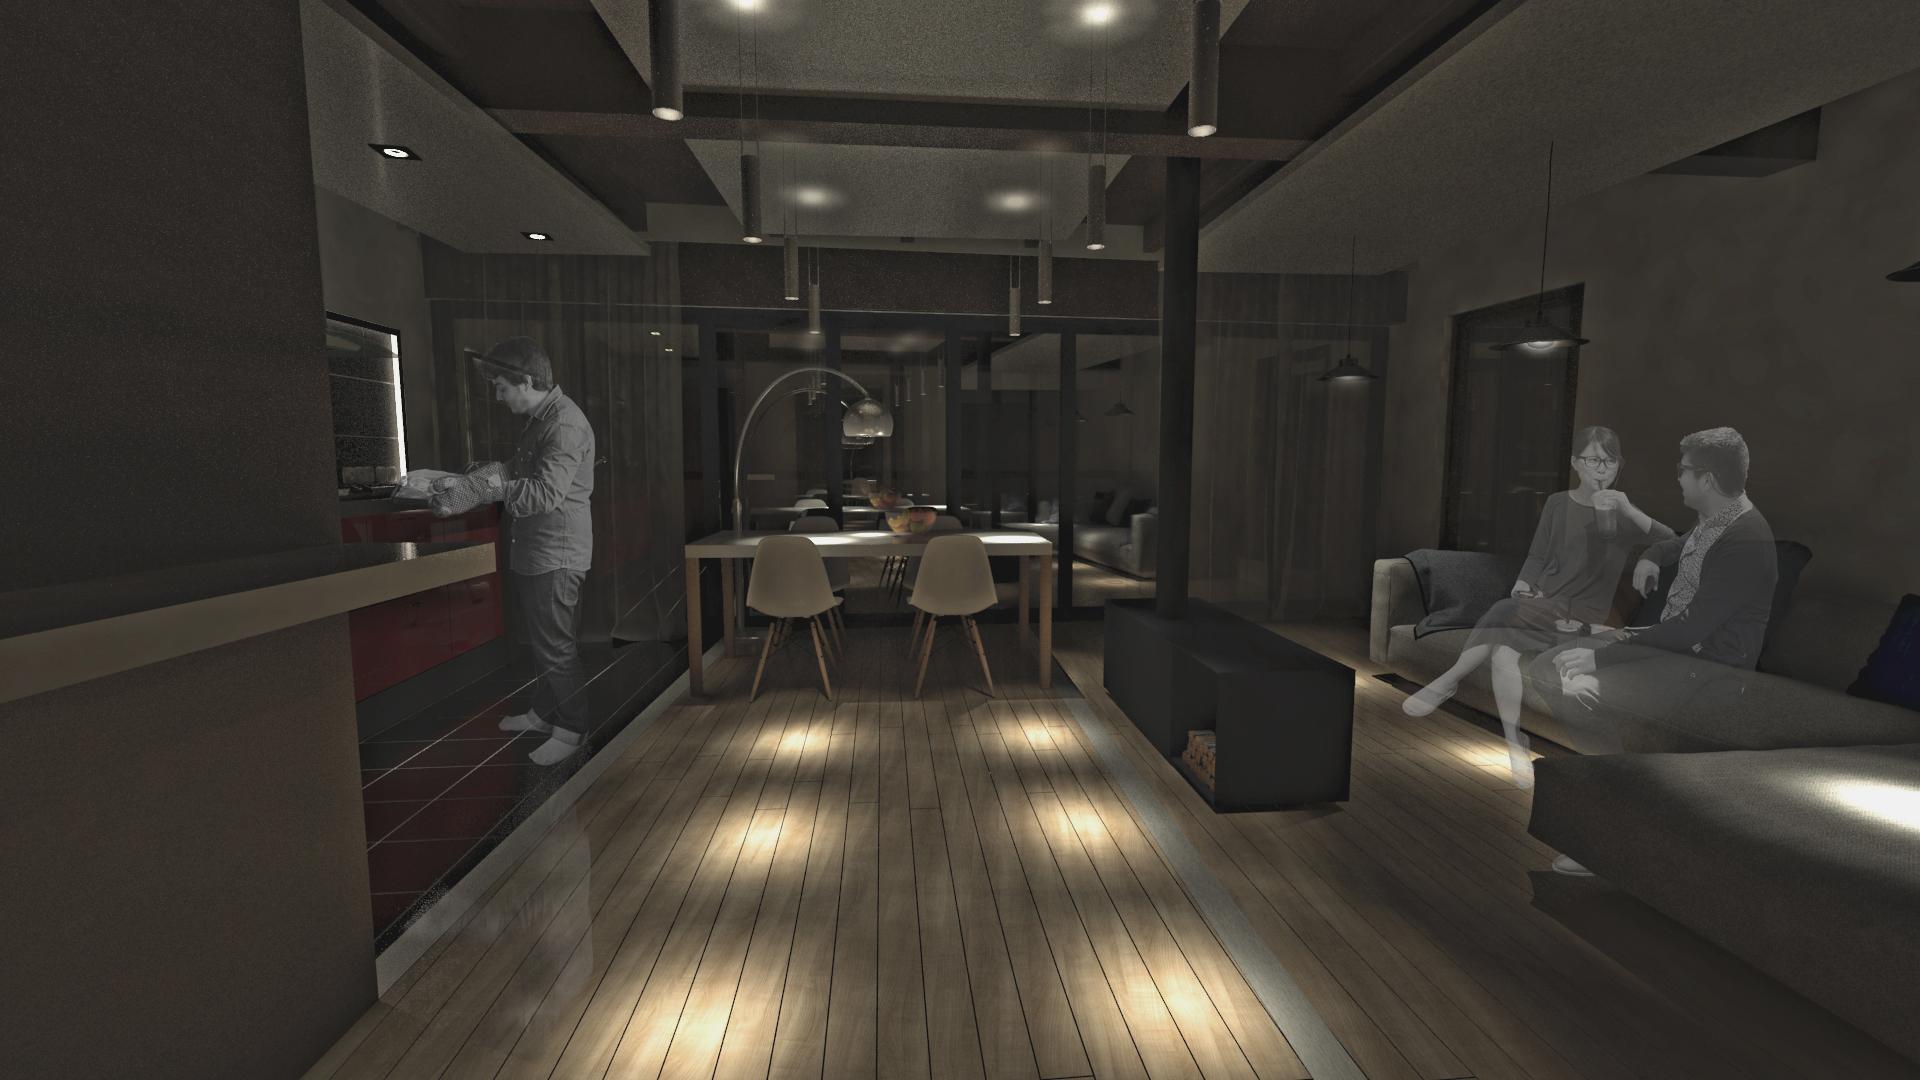 sietequince proyecto vivienda rural diseño p1 salon noche